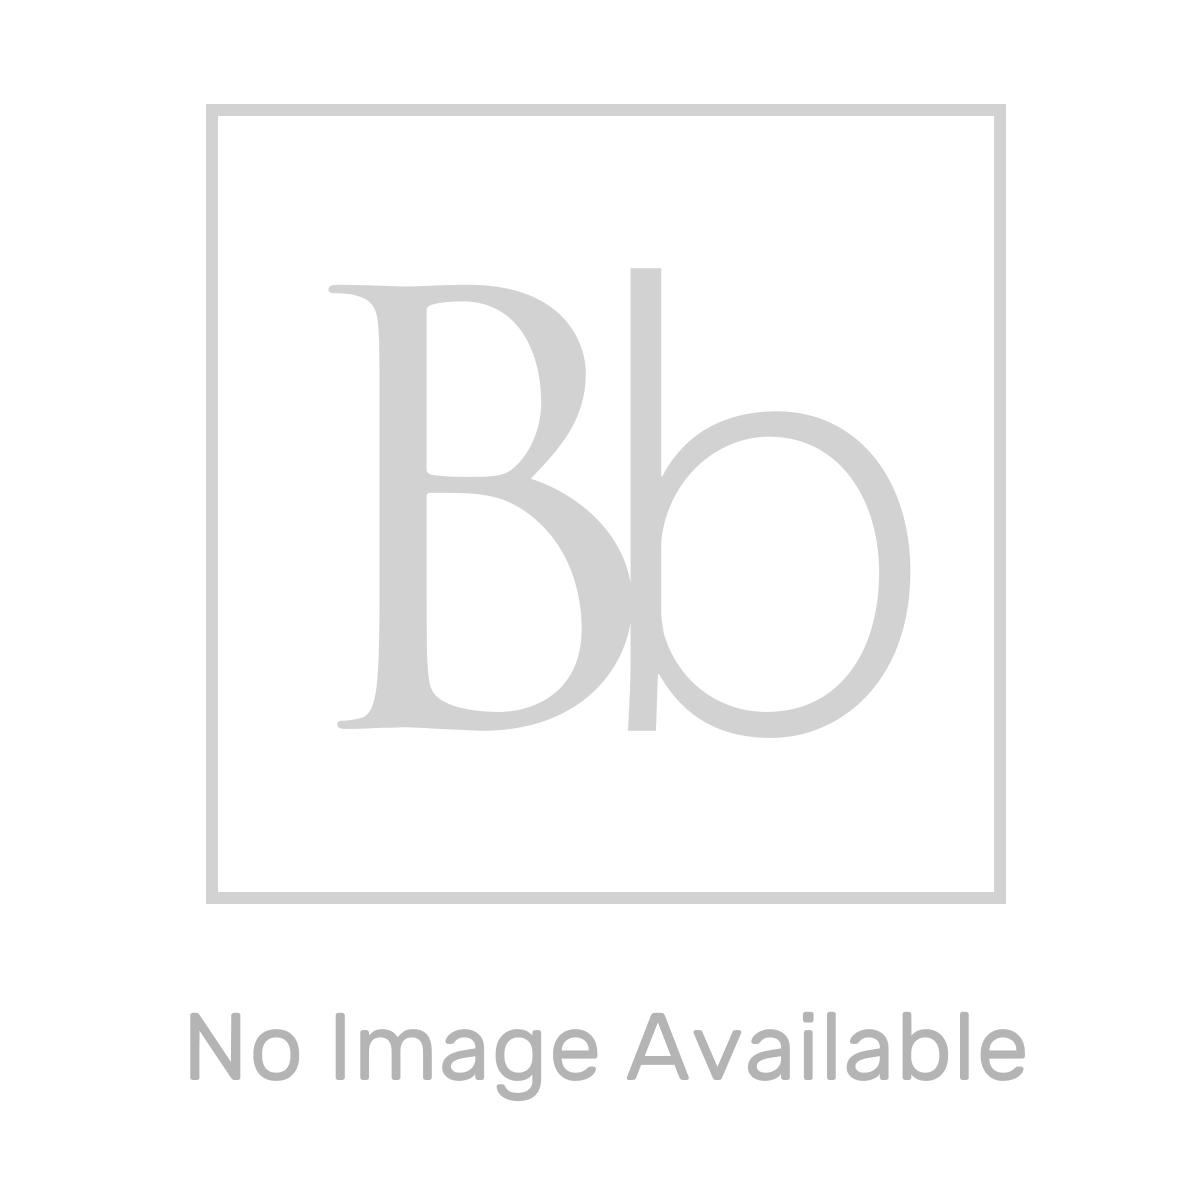 RAK Surface Greige Lappato Tile 750 x 750mm Lifestyle